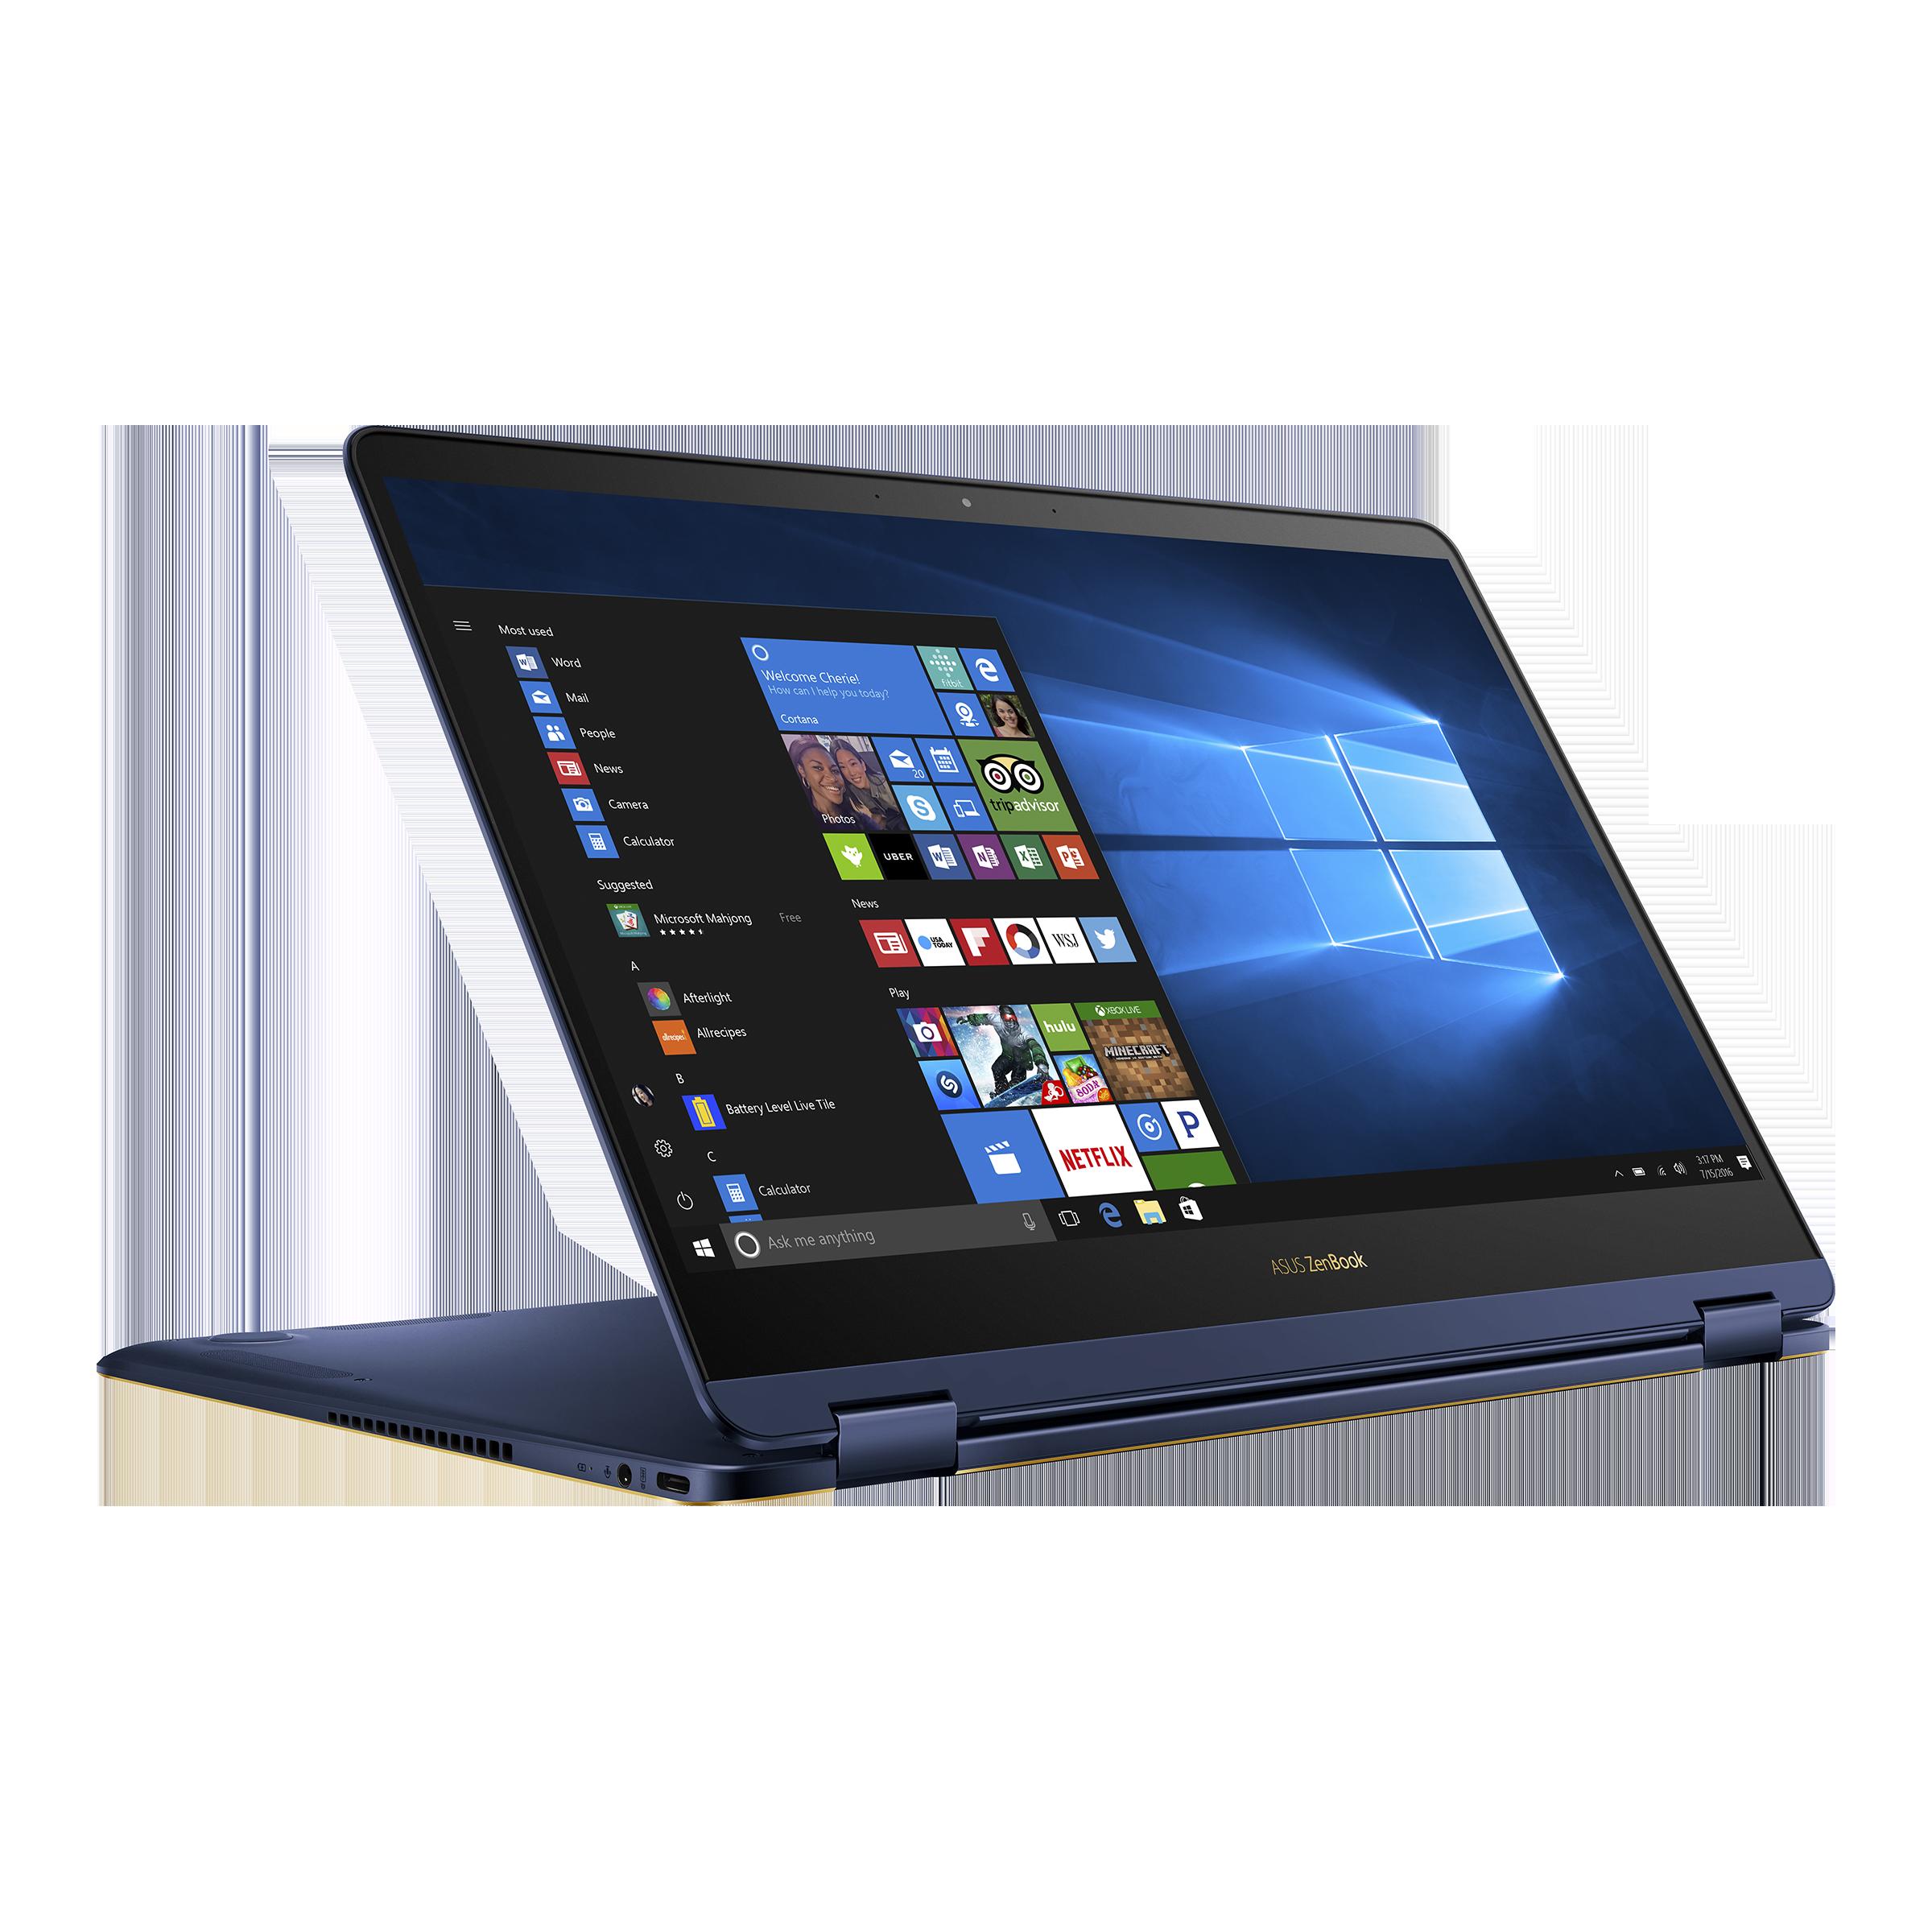 Zenbook Flip S UX370 Laptops For Home ASUS Global